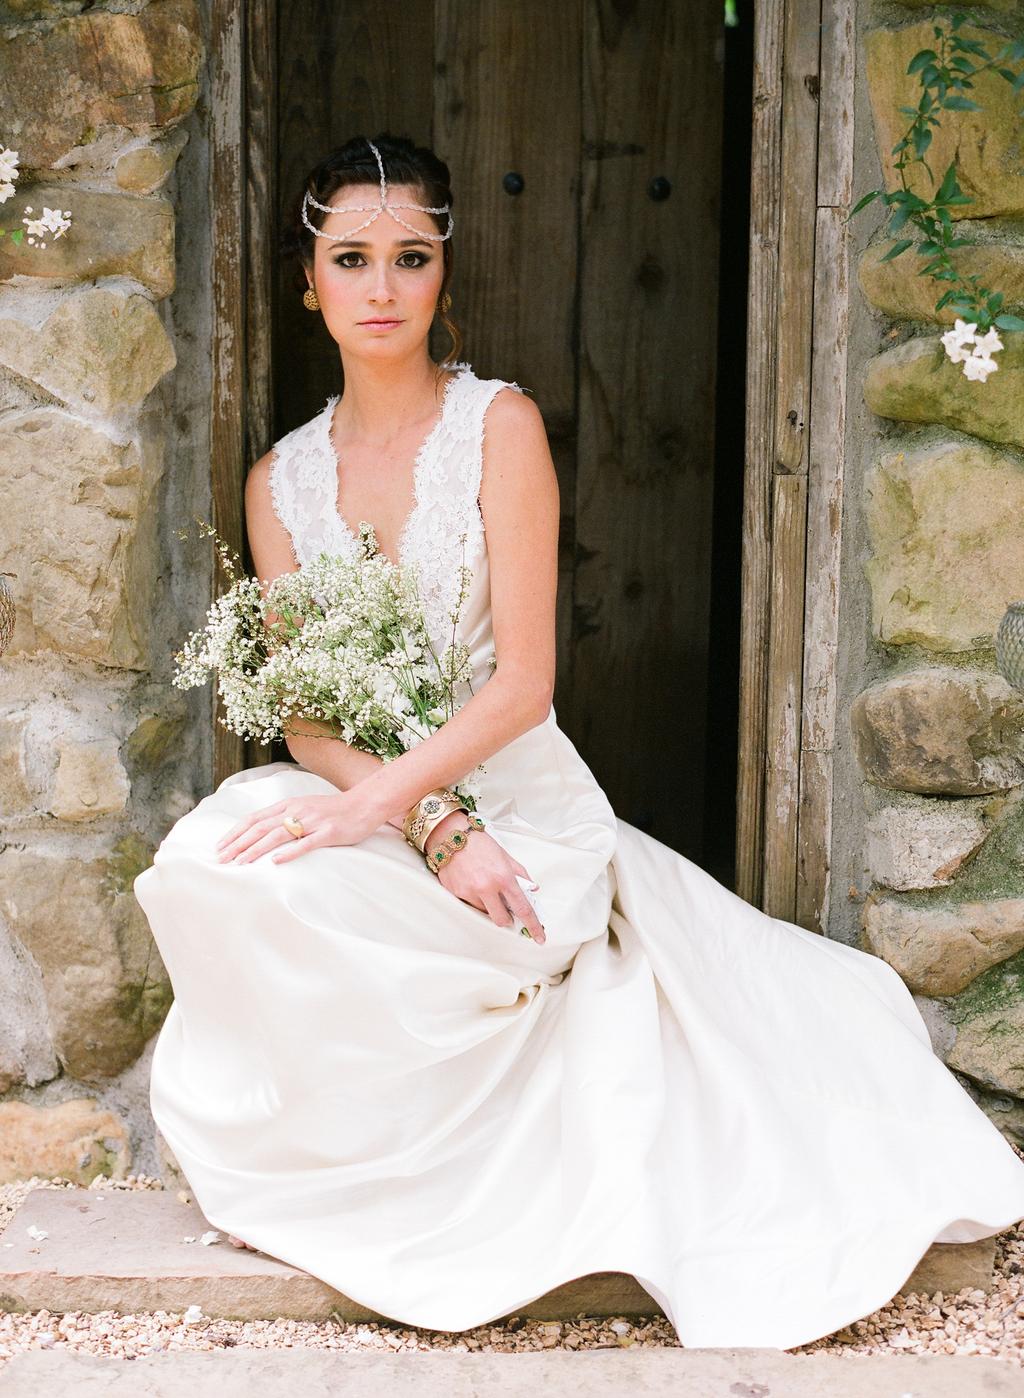 Styled-wedding-santa-barbara-chic-beaux-arts-photographie-italian-bohemian-wedding-bride-wedding-dress-lace-white-flowers-bouquet-051.full